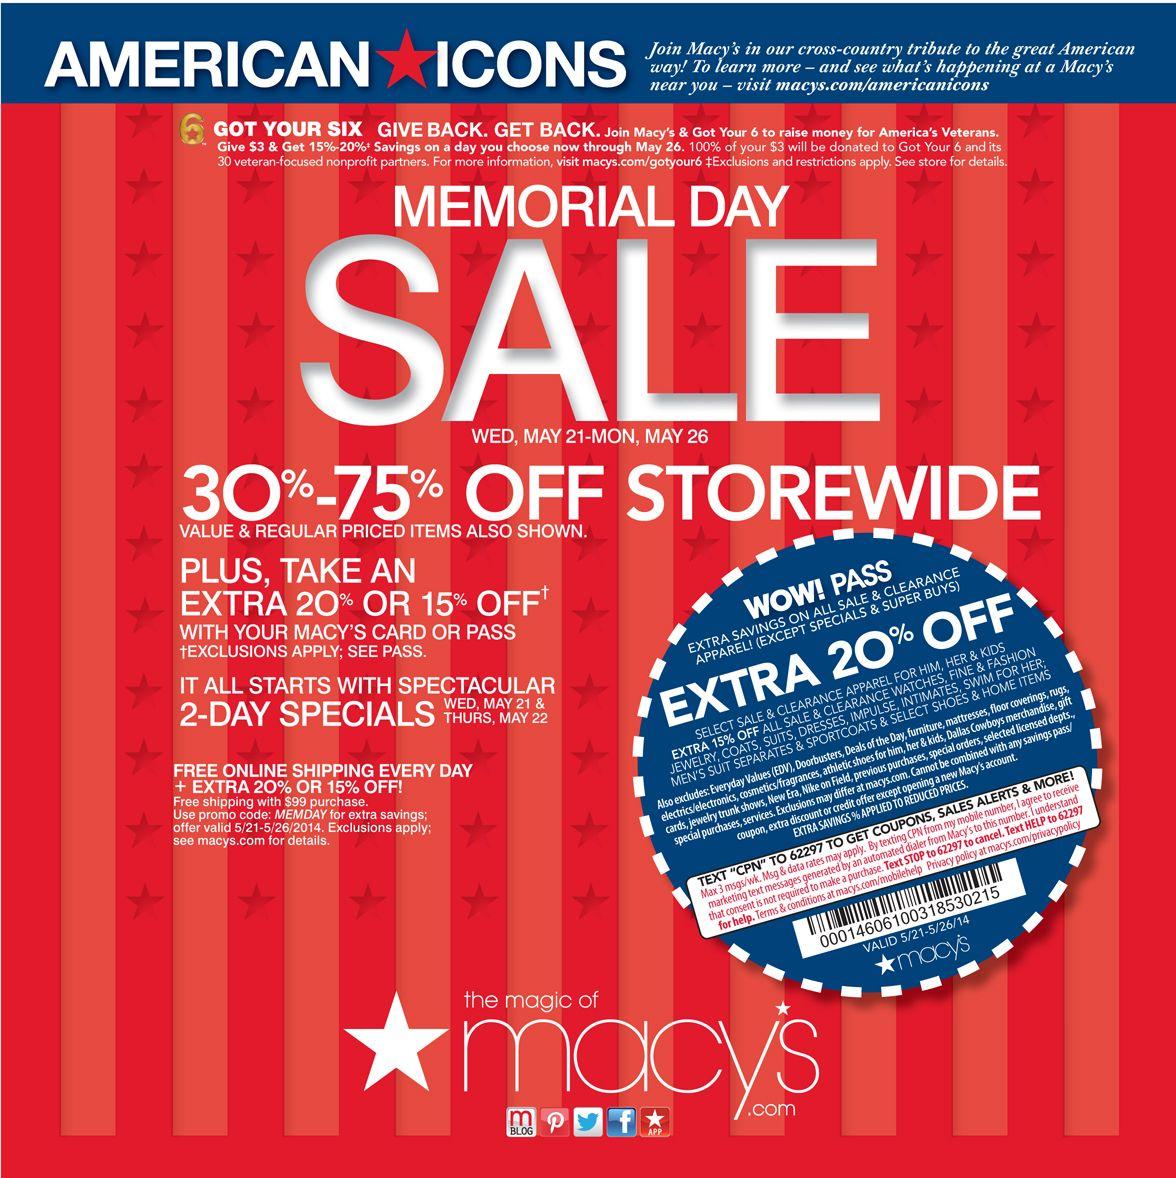 Macy's Veteran's Day Sale 2015 Veterans day discounts